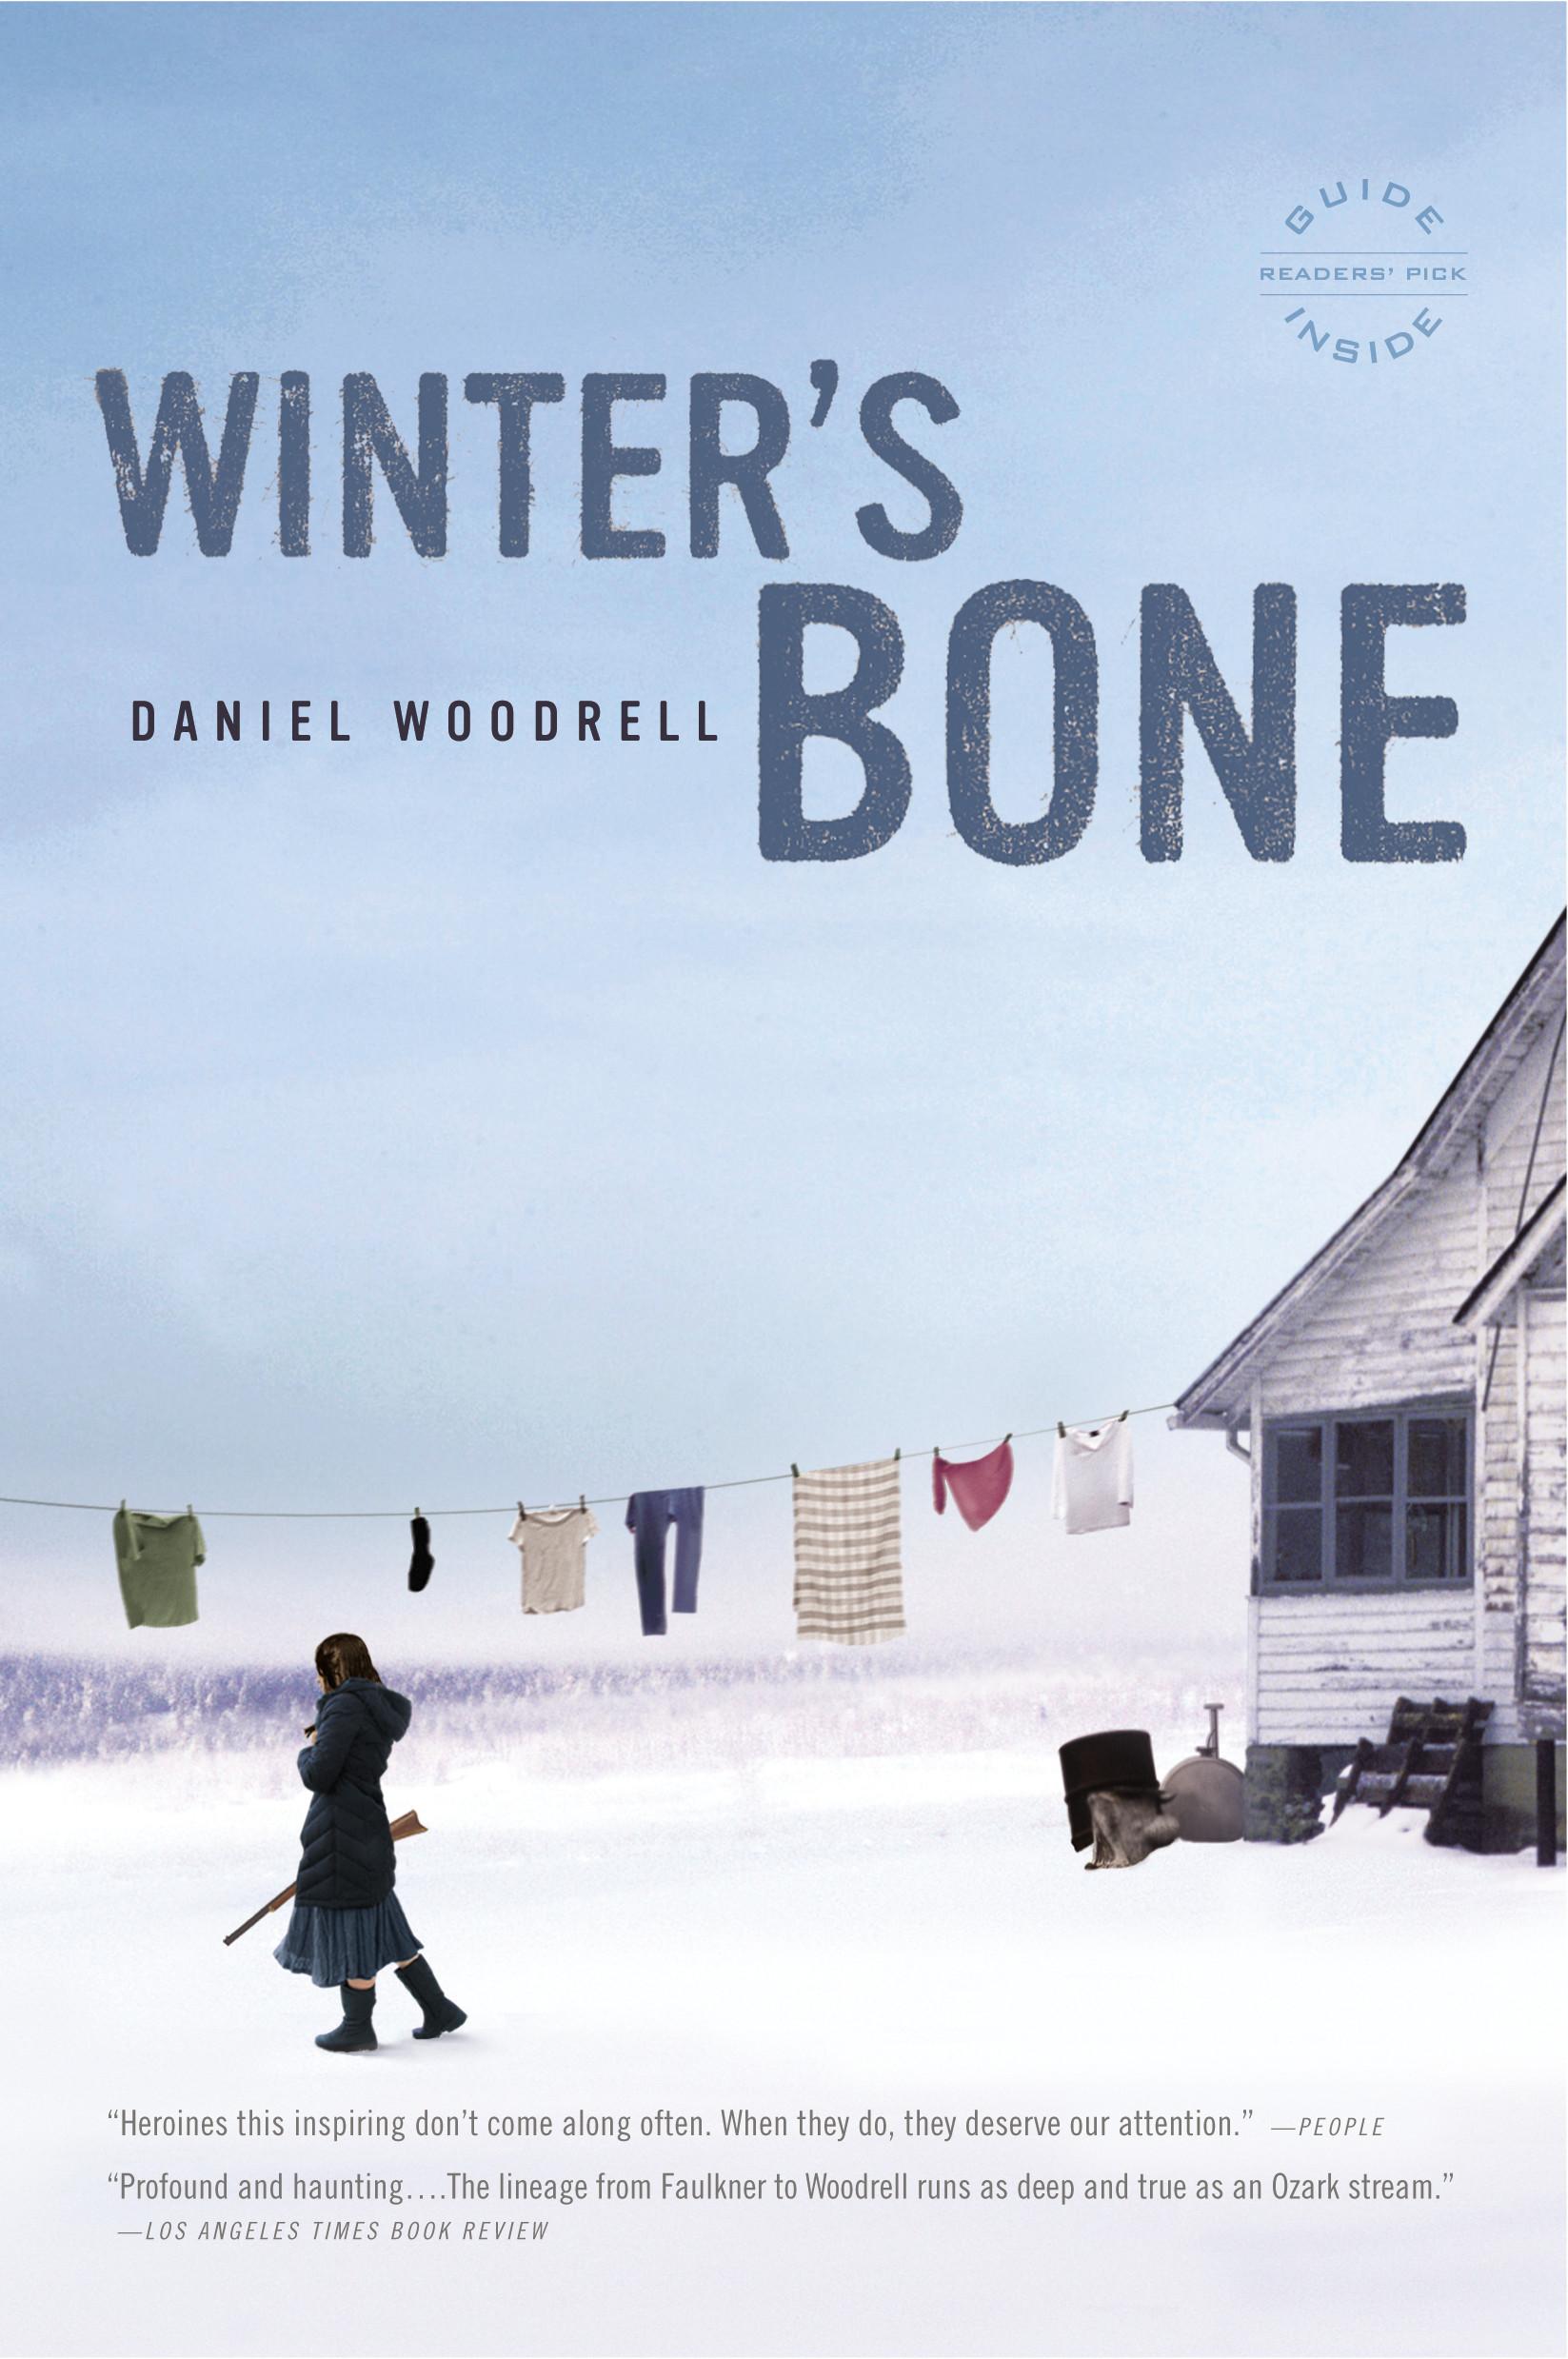 Woodrell_Winter_sBone.JPG